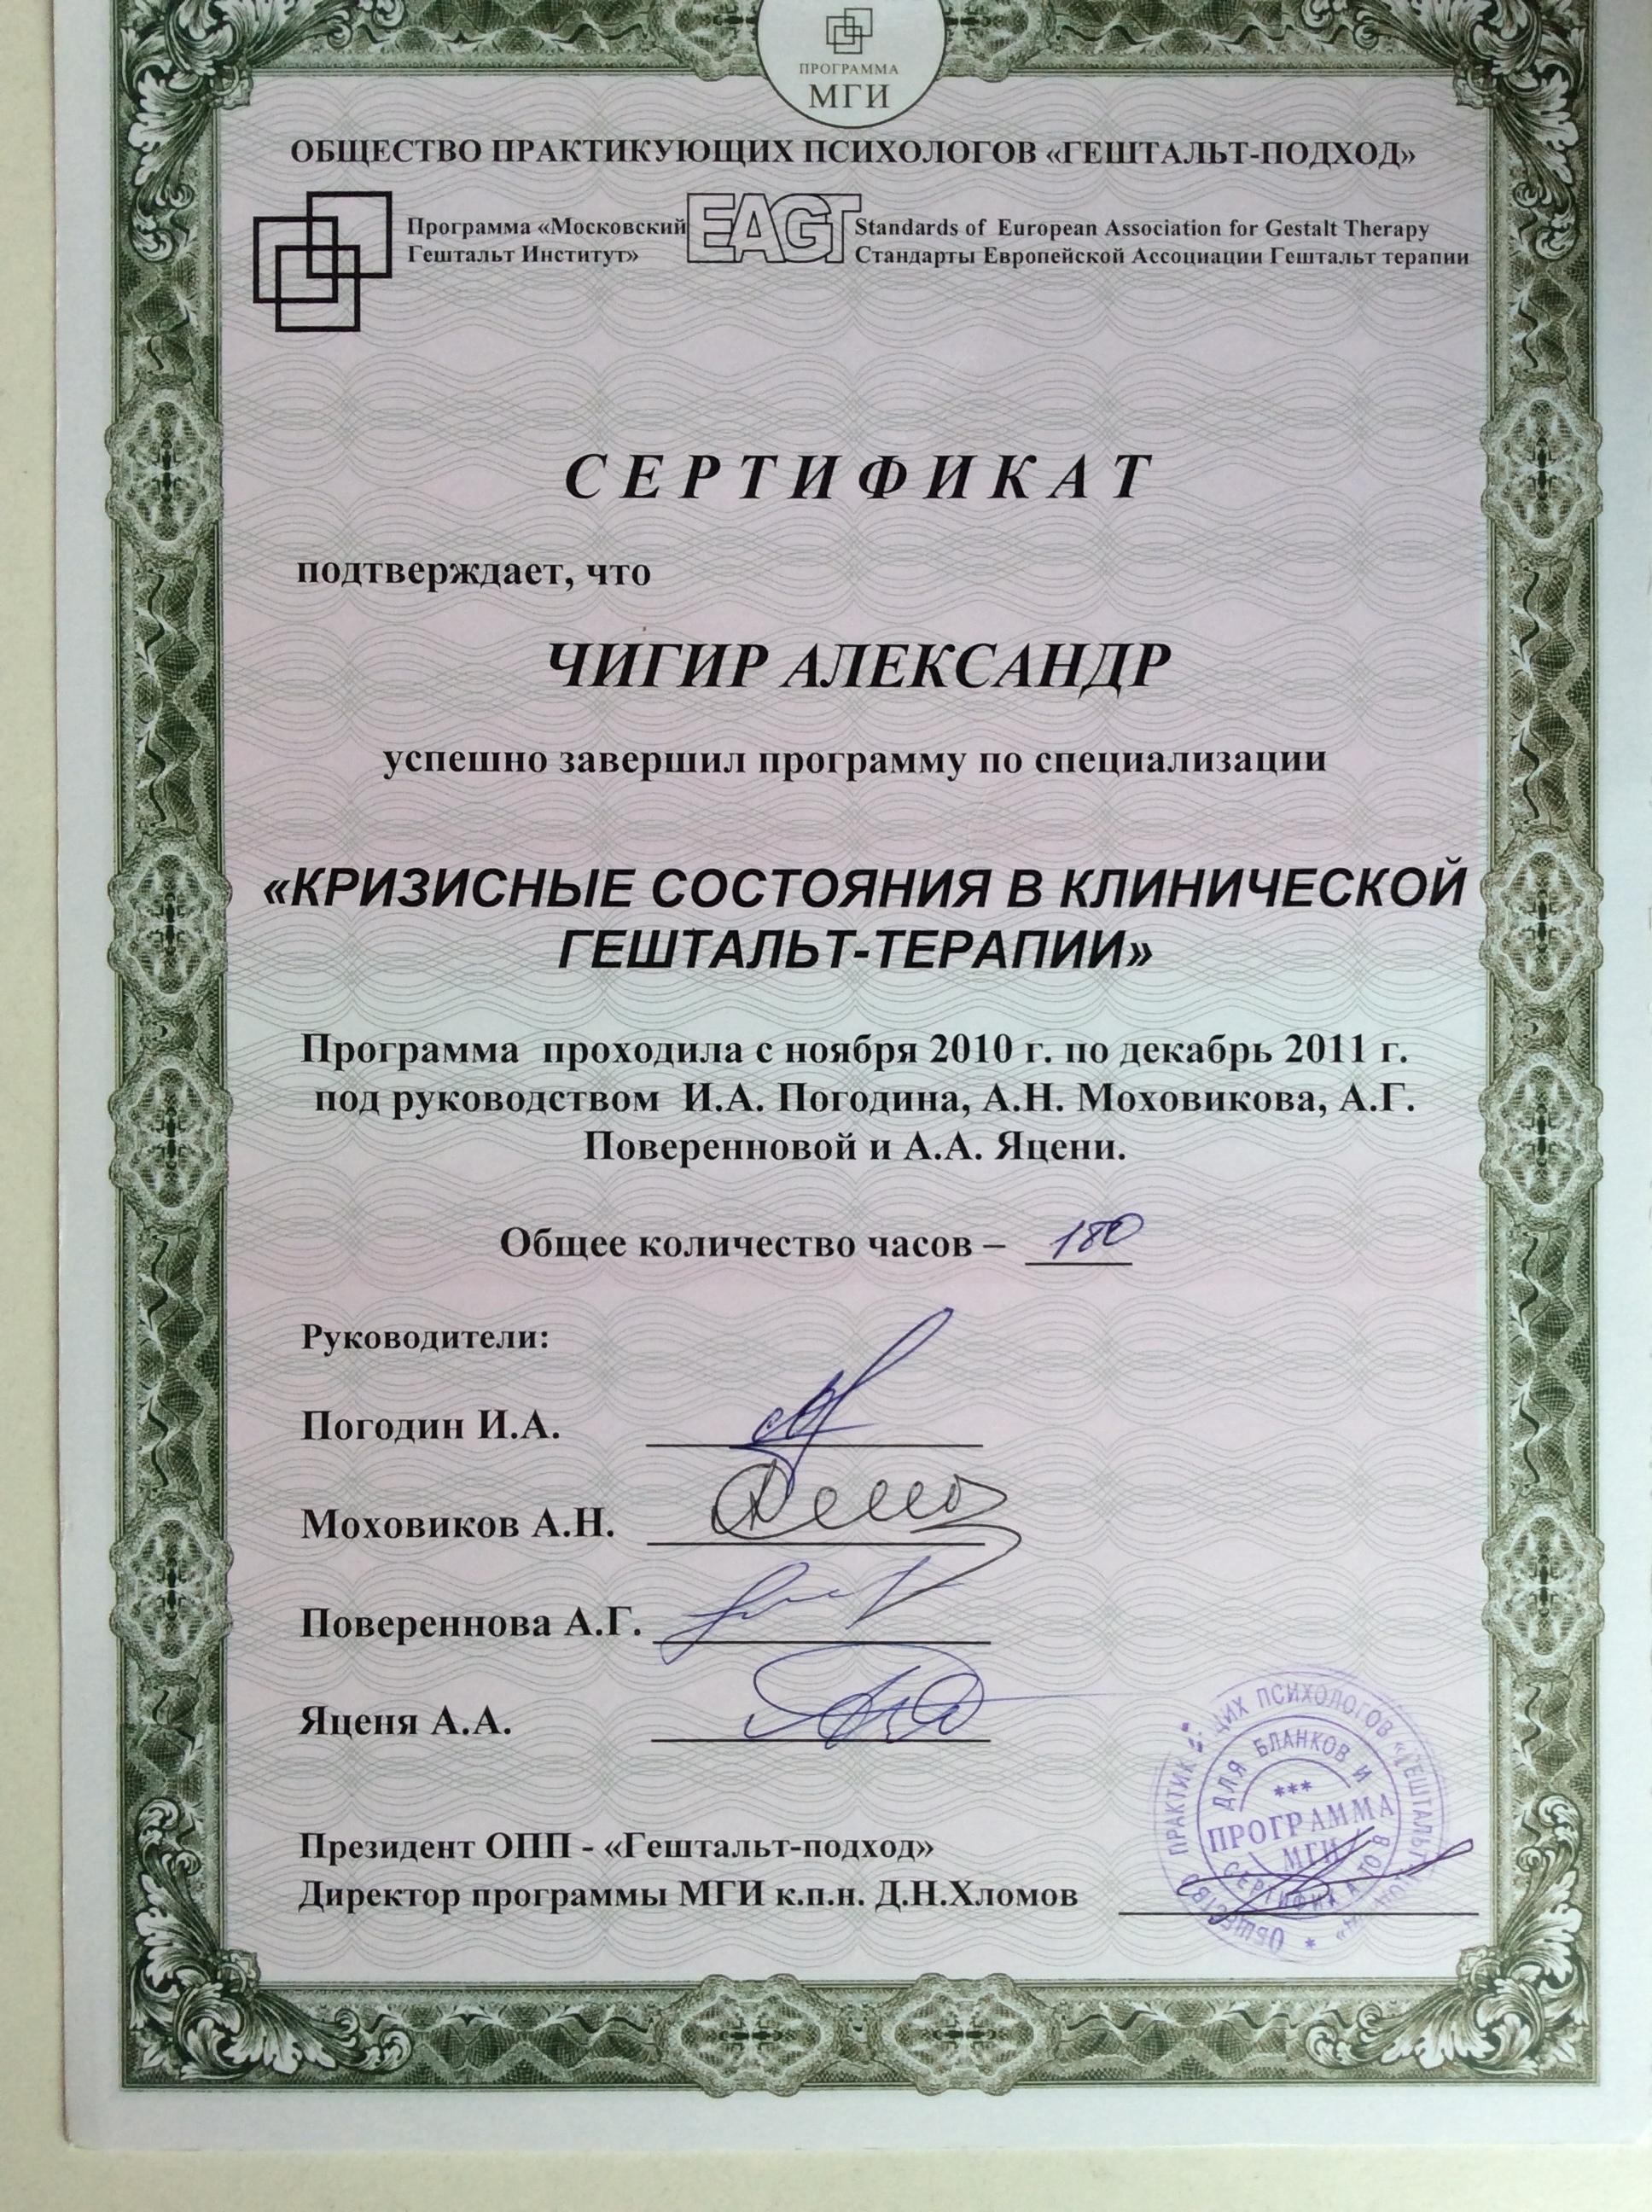 Чигир Александр гештальт-терапевт